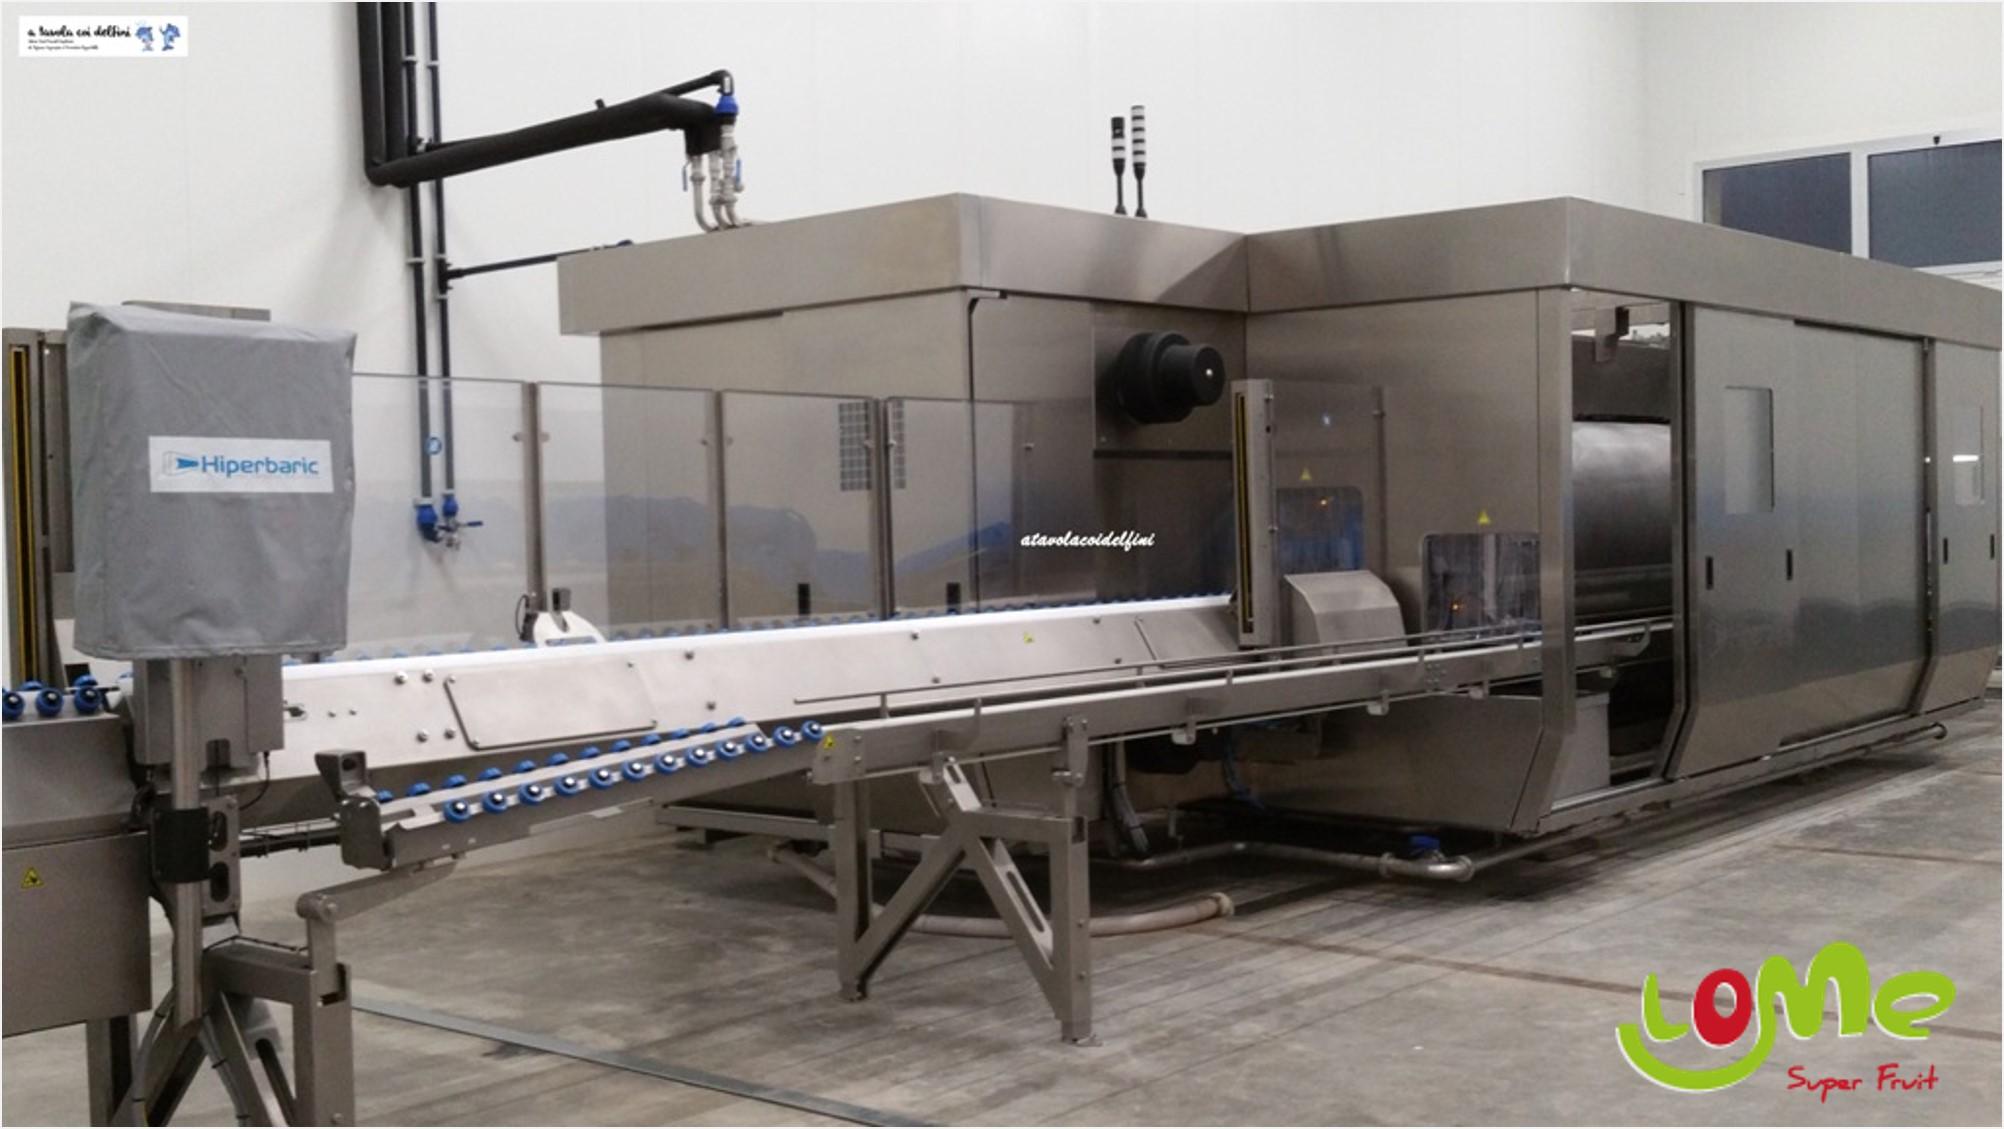 Hiperbaric 420 in the new facilities of Masseria Fruttirossi in Castellaneta. Source: http://www.atavolacoidelfini.com